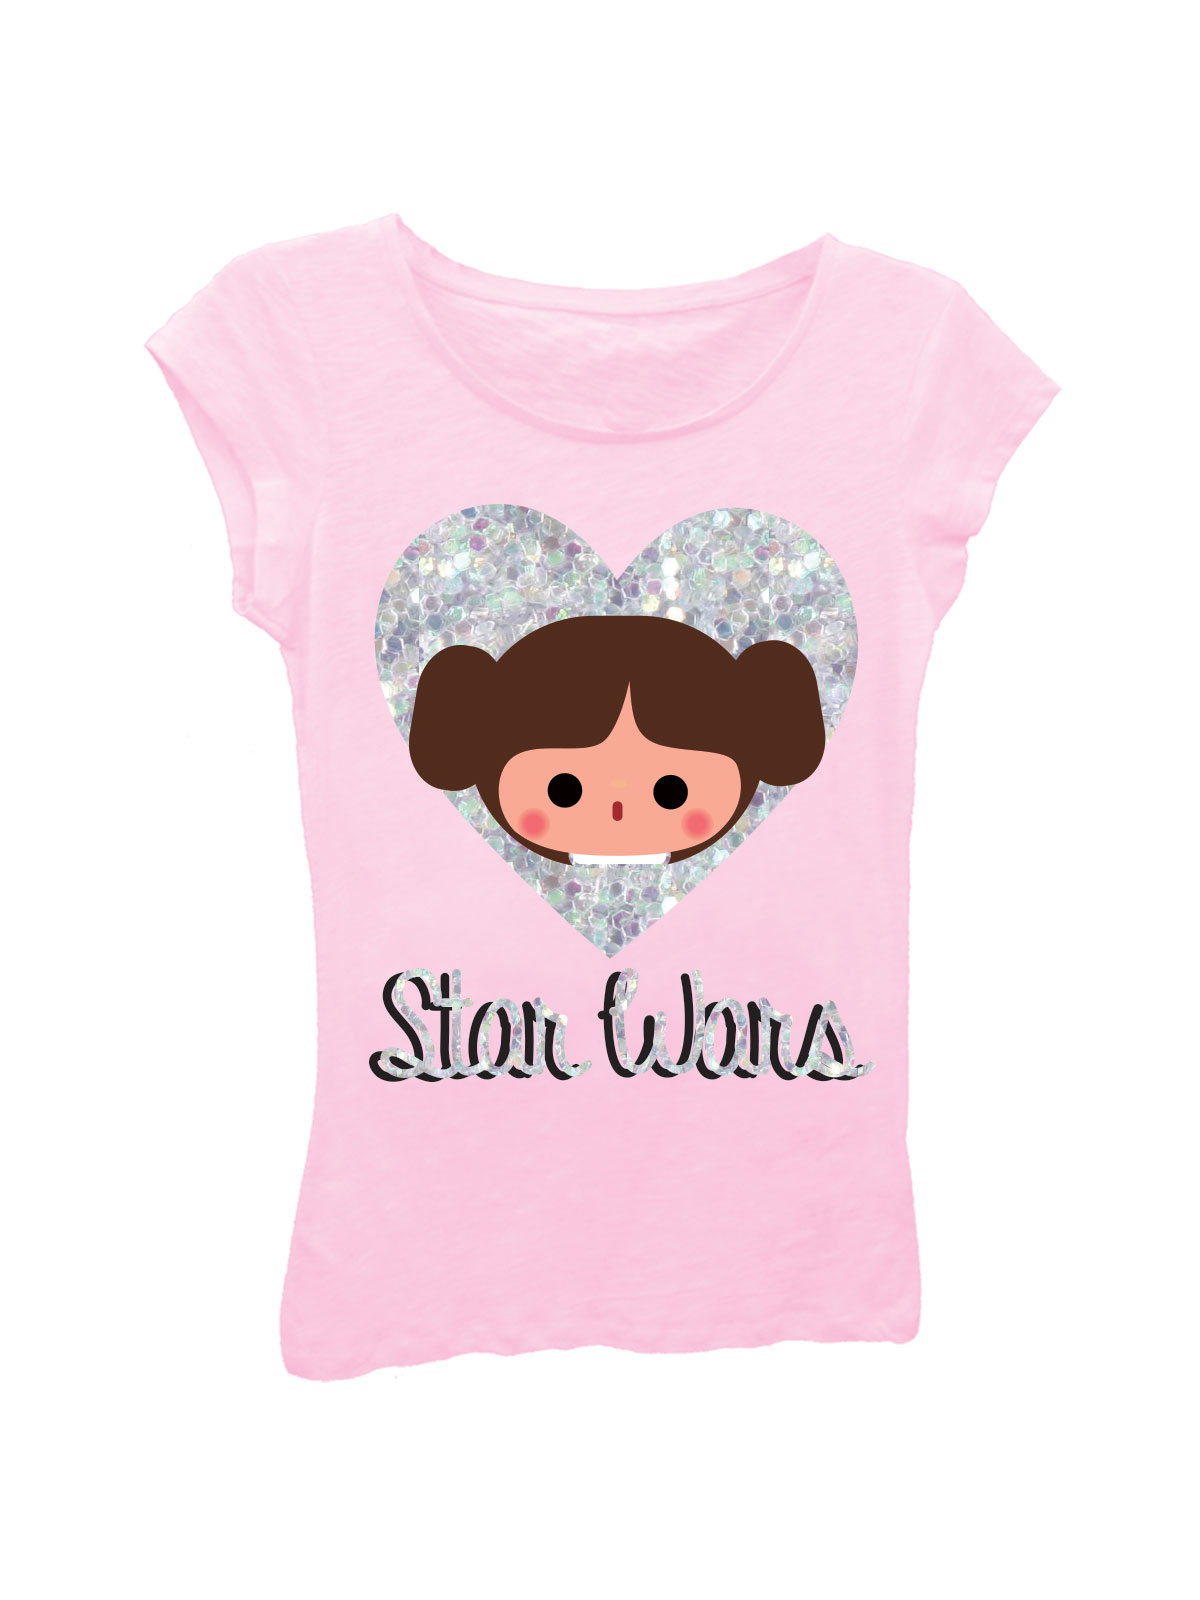 Star Wars The Last Jedi Chewbacca Porg Friends Girls Graphic T Shirt